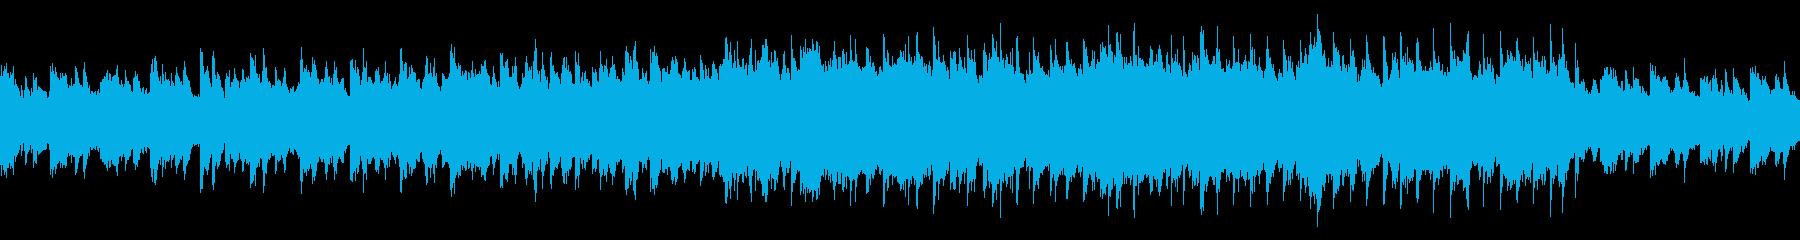 VP系19B、幸福感、癒し、ピアノ&弦の再生済みの波形